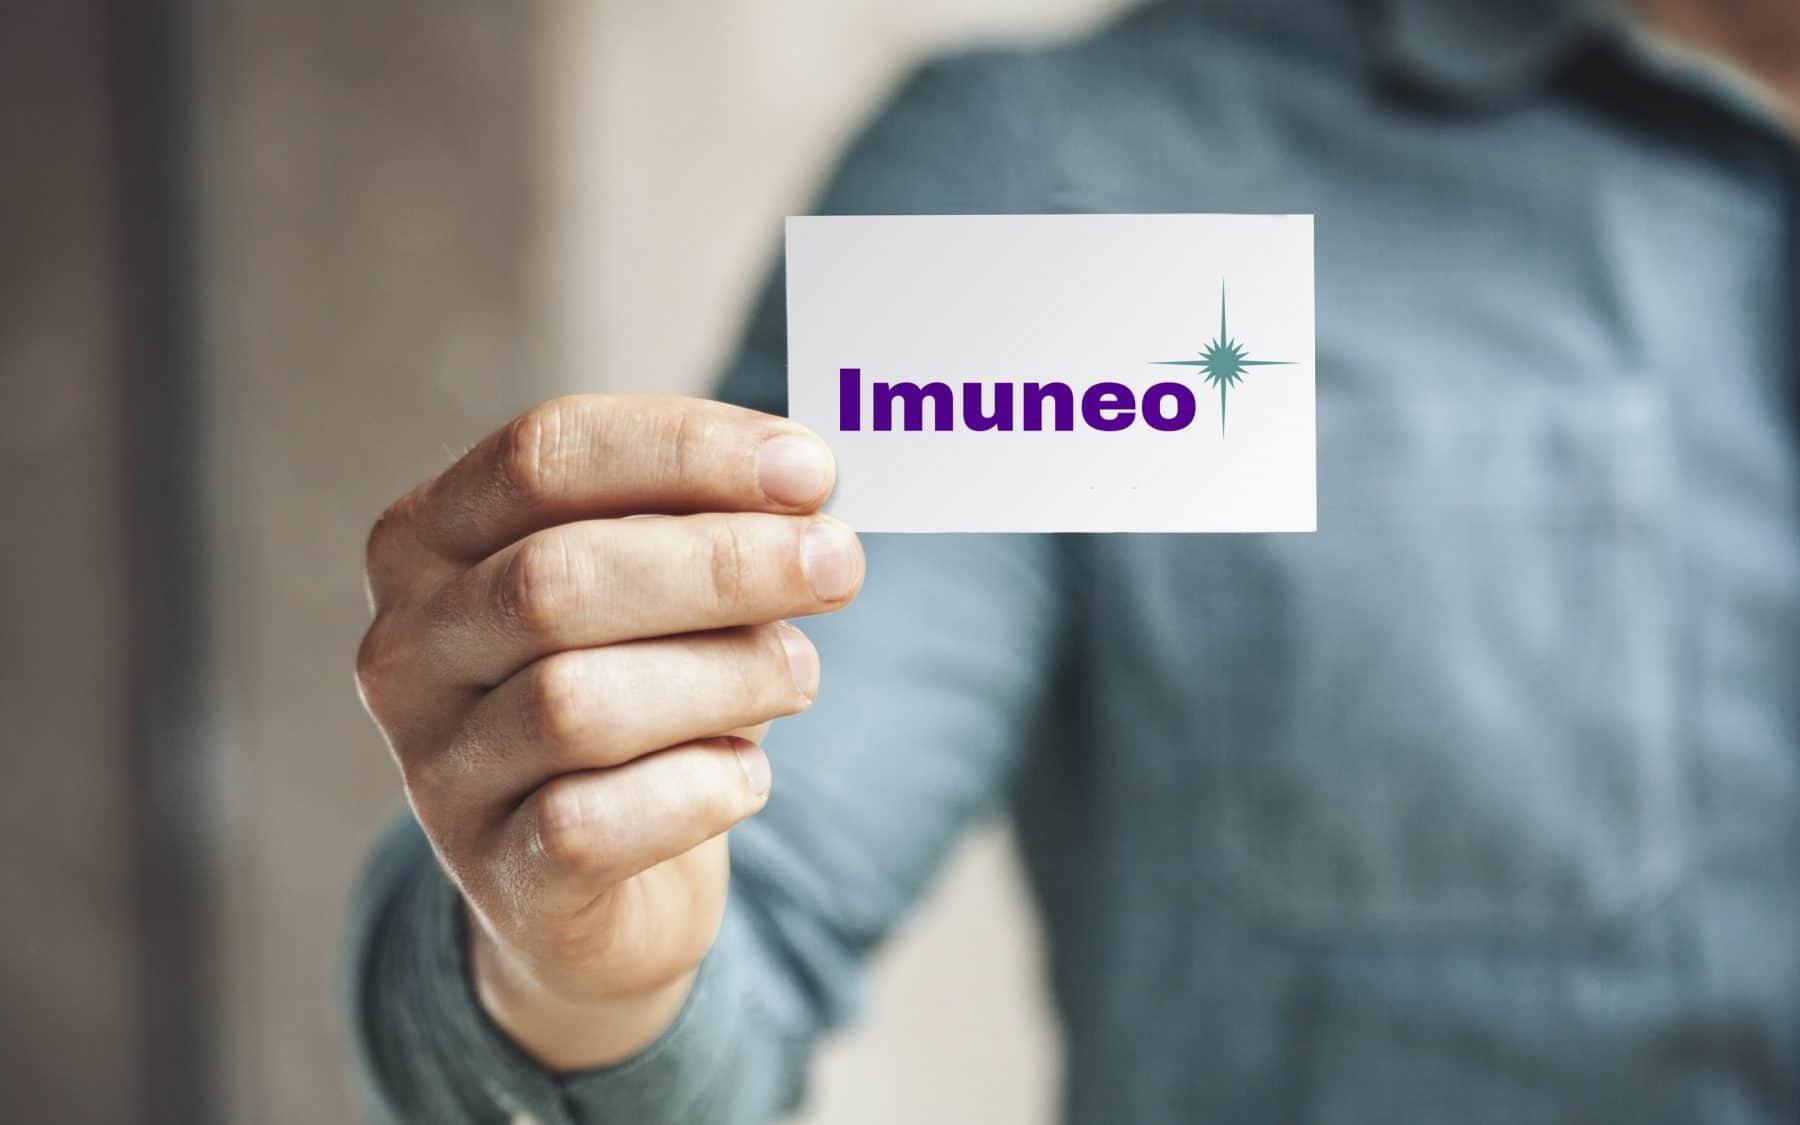 Imuneo